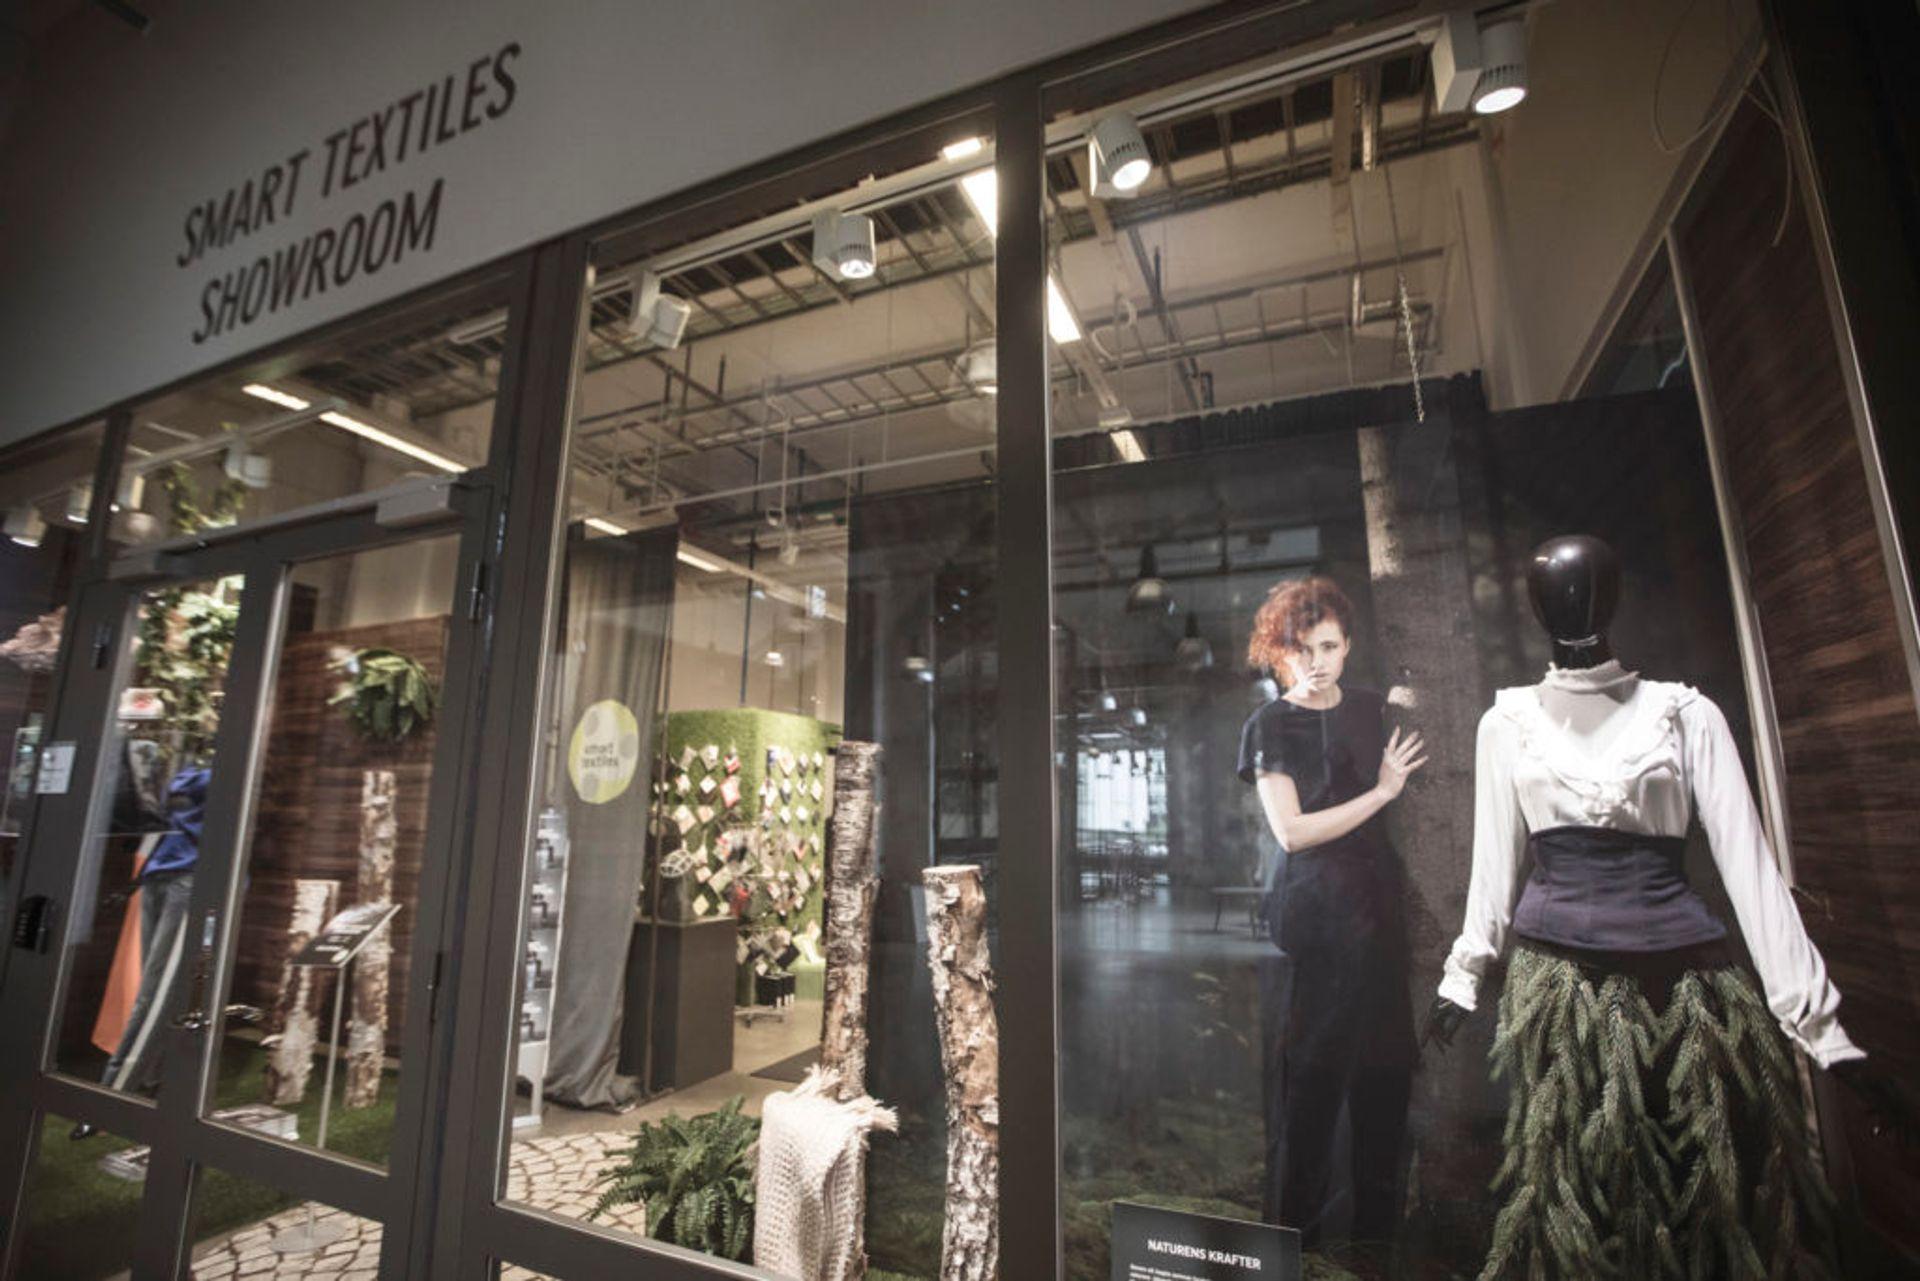 The Smart Textiles showroom display.